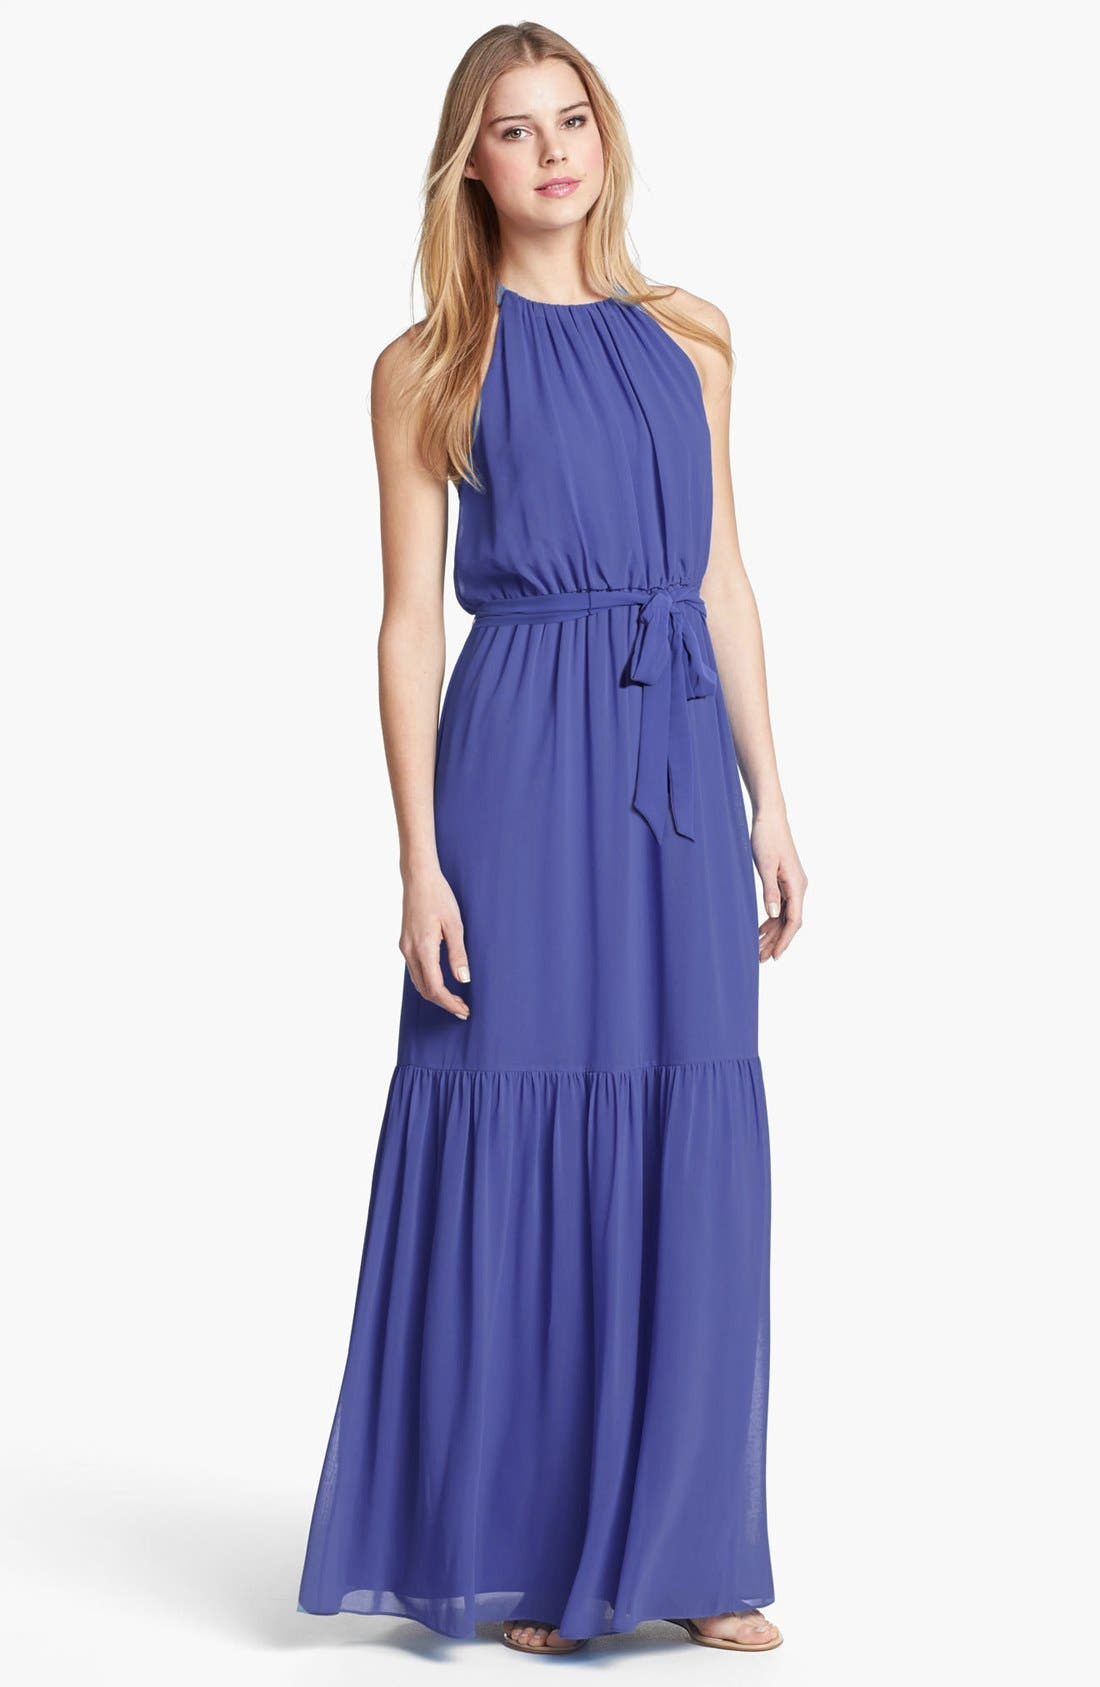 Alternate Image 1 Selected - Jessica Simpson Laser Cutout Maxi Dress